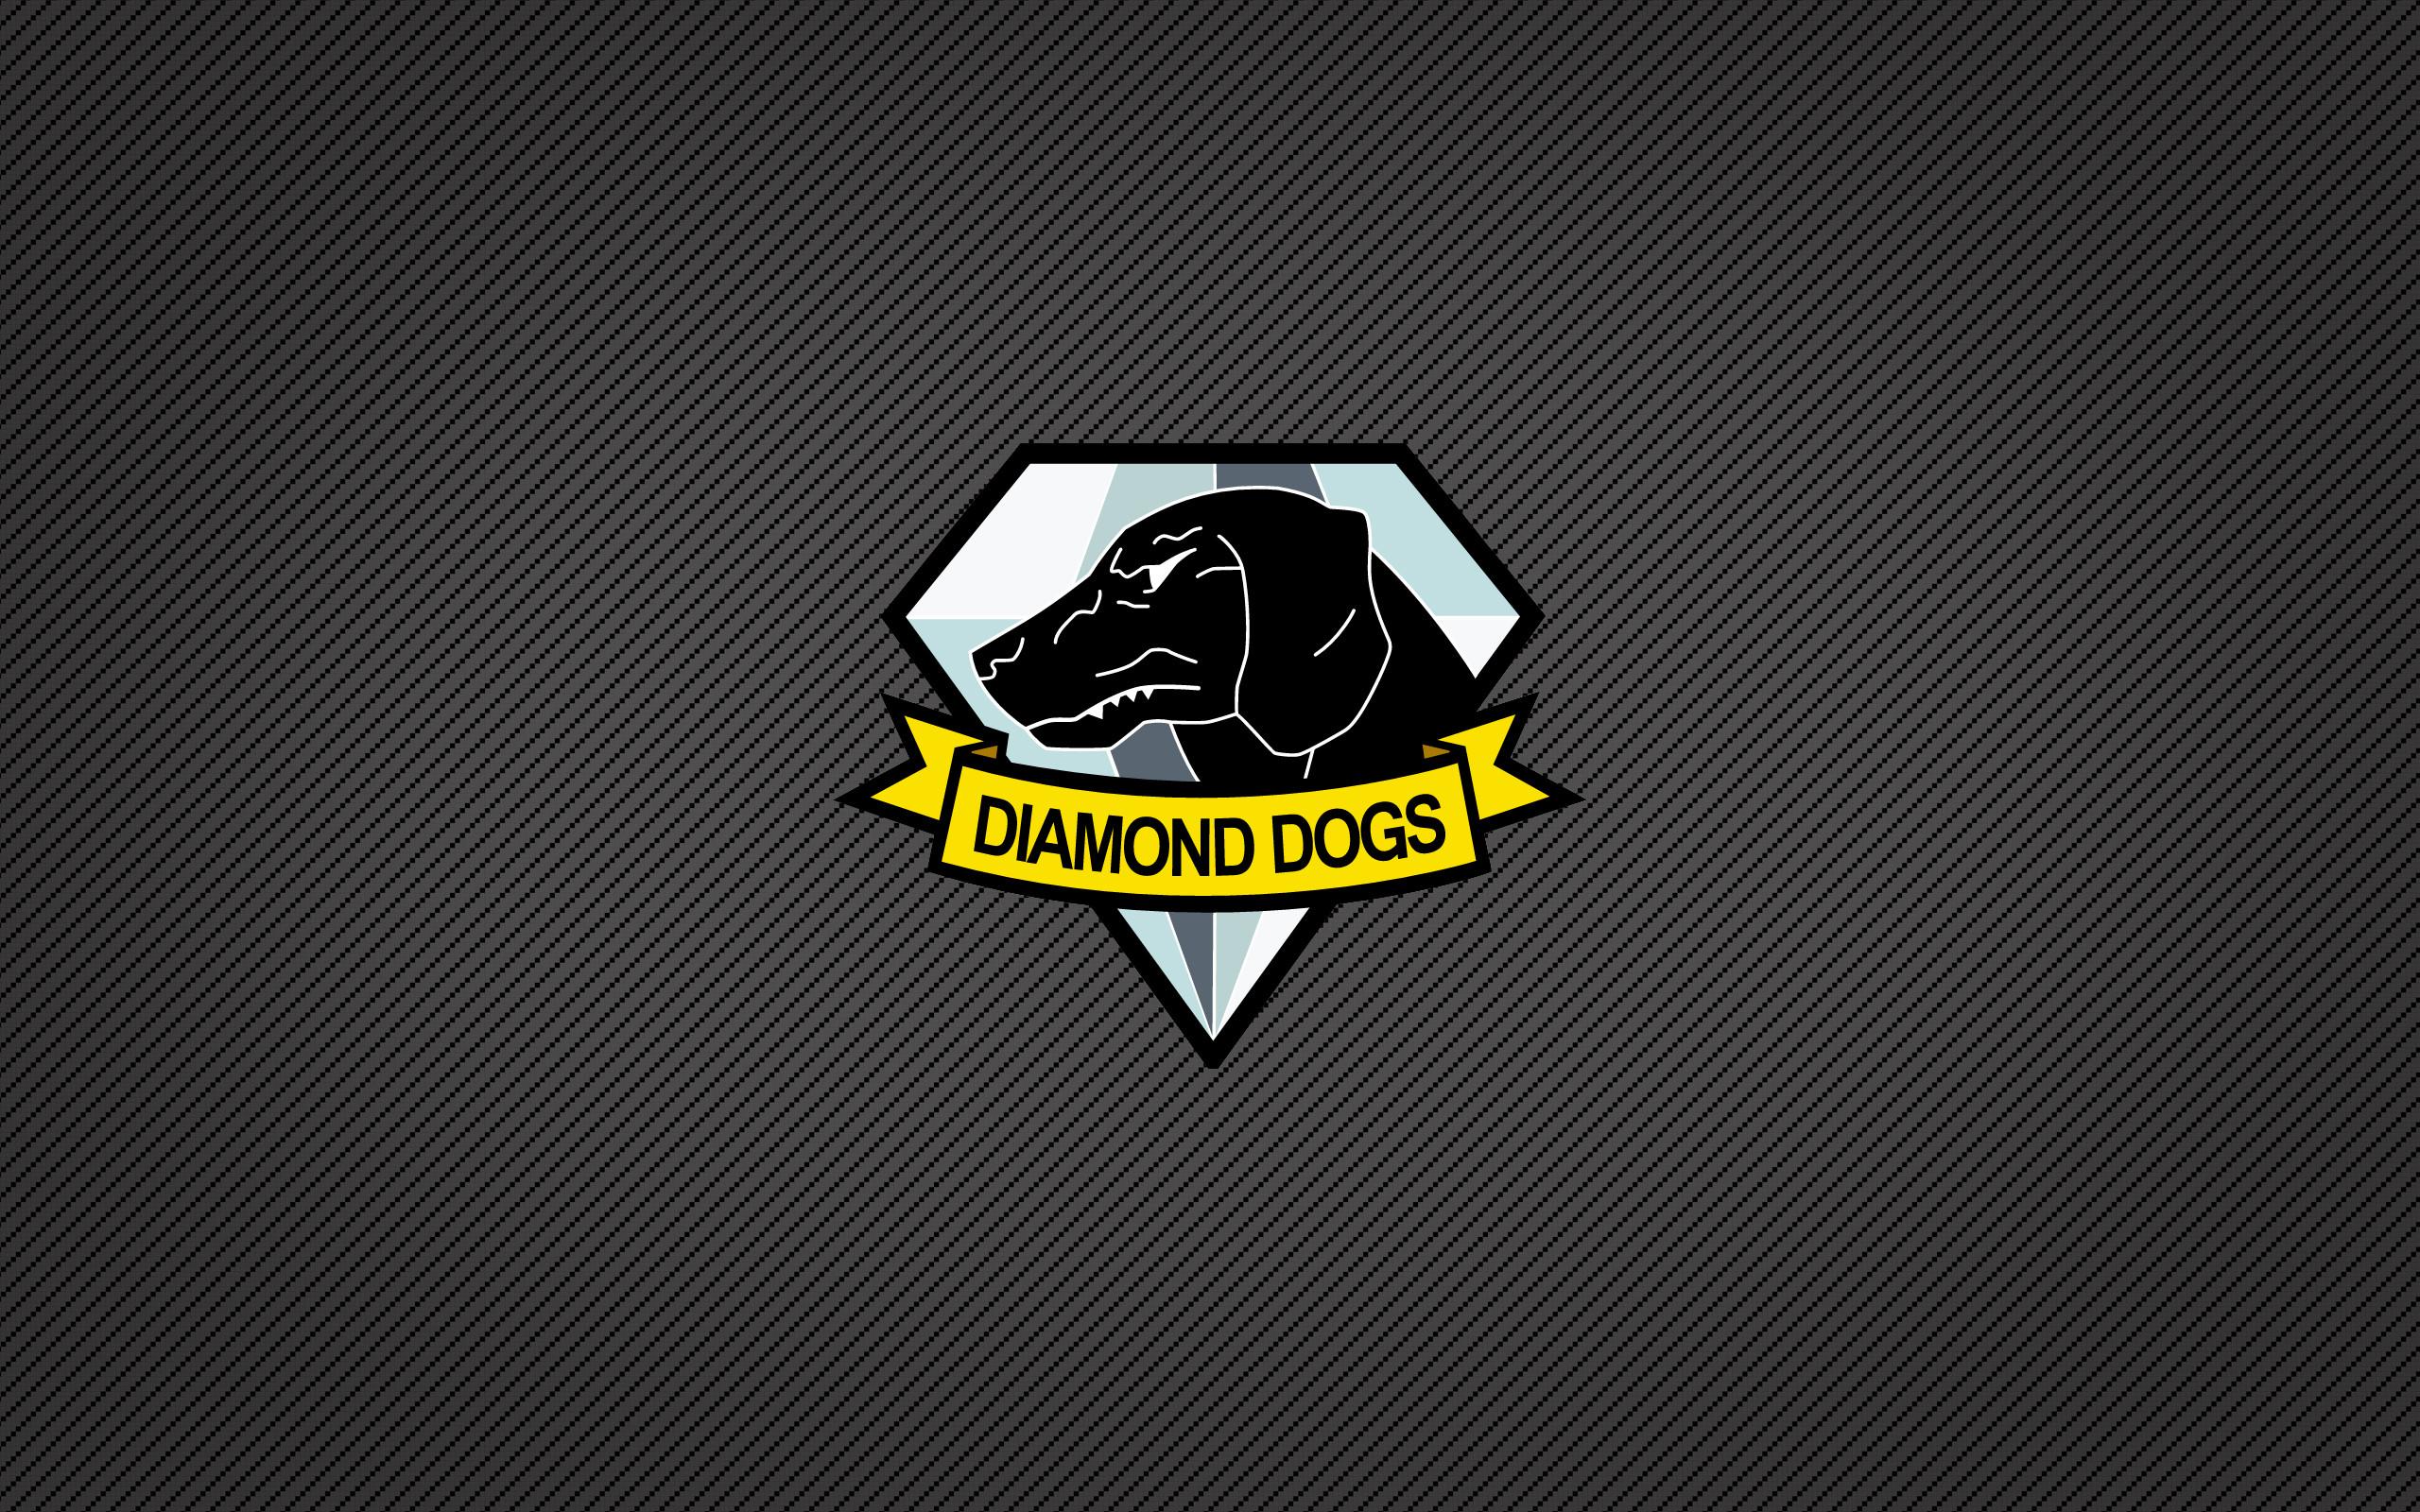 Video Game – Metal Gear Solid Video Game Minimalist Black Dog Diamond Logo  Metal Gear Solid